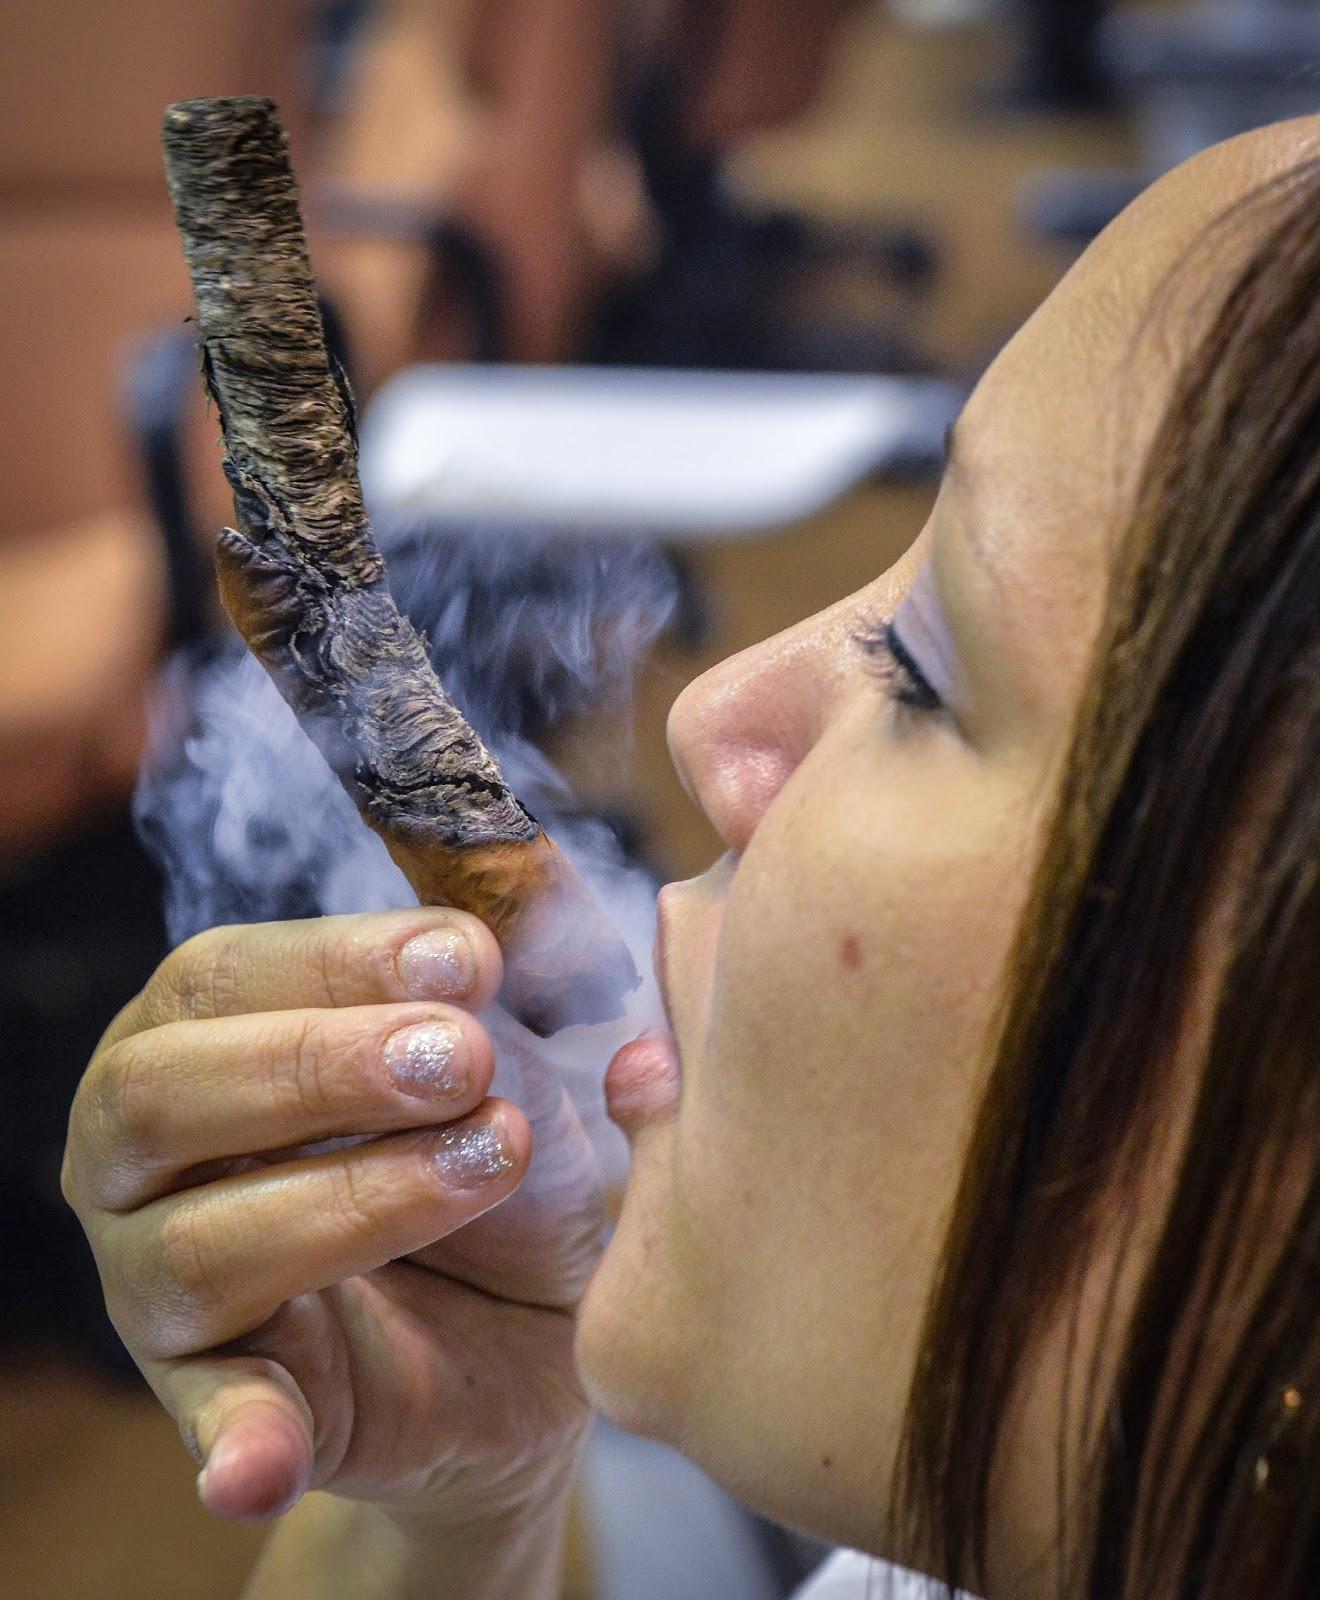 Havana Cigar Festival, Cigar, Festival, Contest, Competition, Long-ash, Cuba, Business, Economy, Tobacco, XVI Havana Cigar Festival, Participate, Smokers, Smoking,